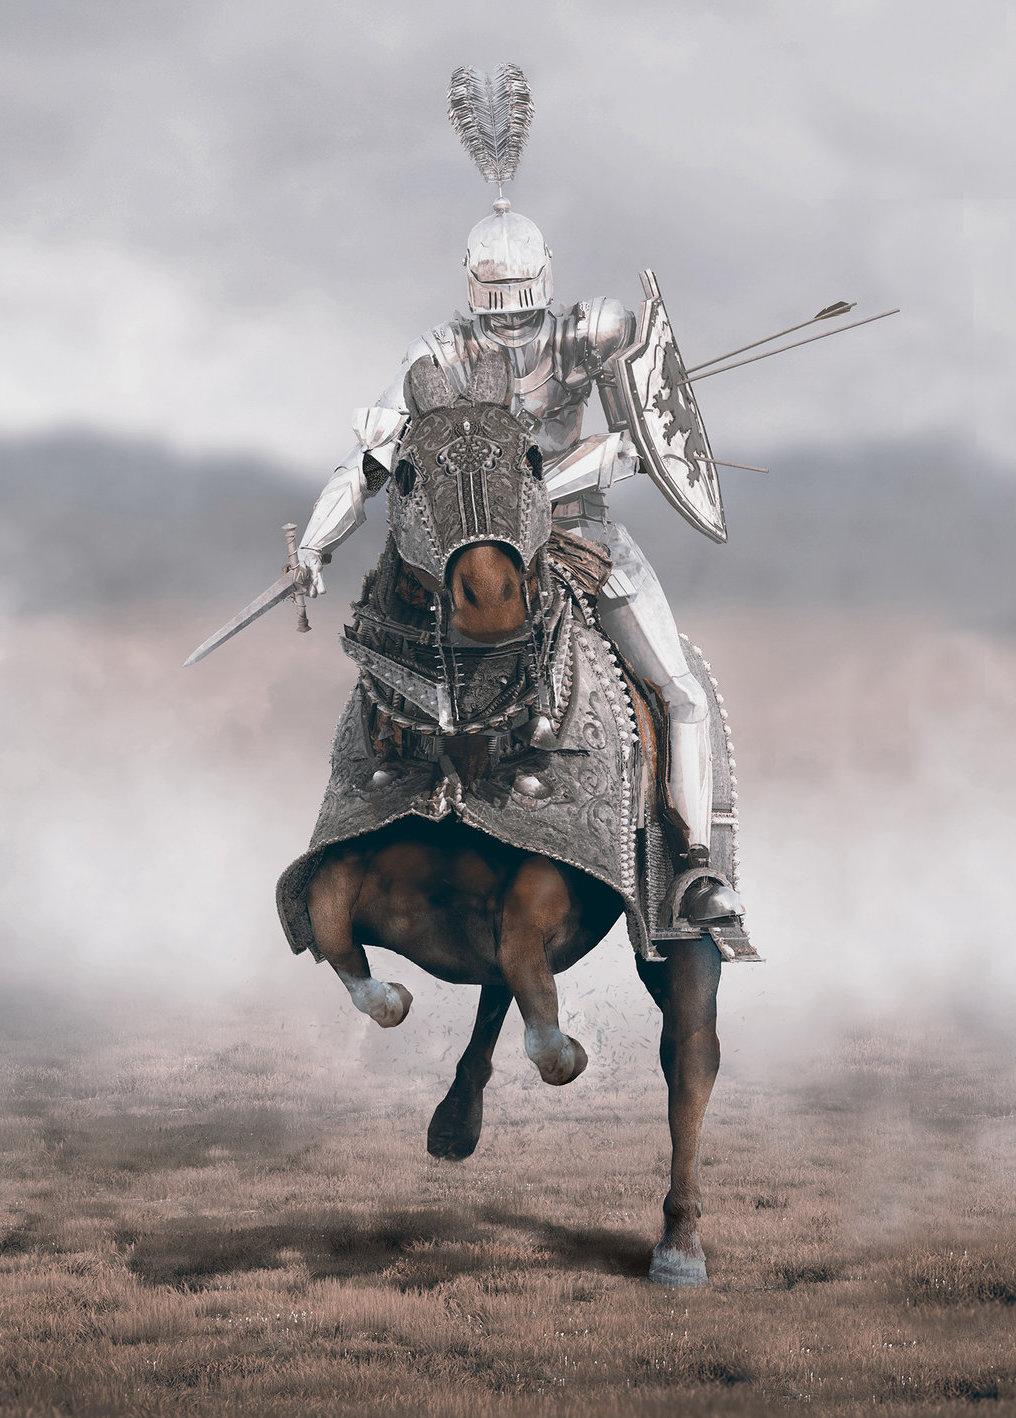 white_knight_by_marcjamesart-d8nhyc5